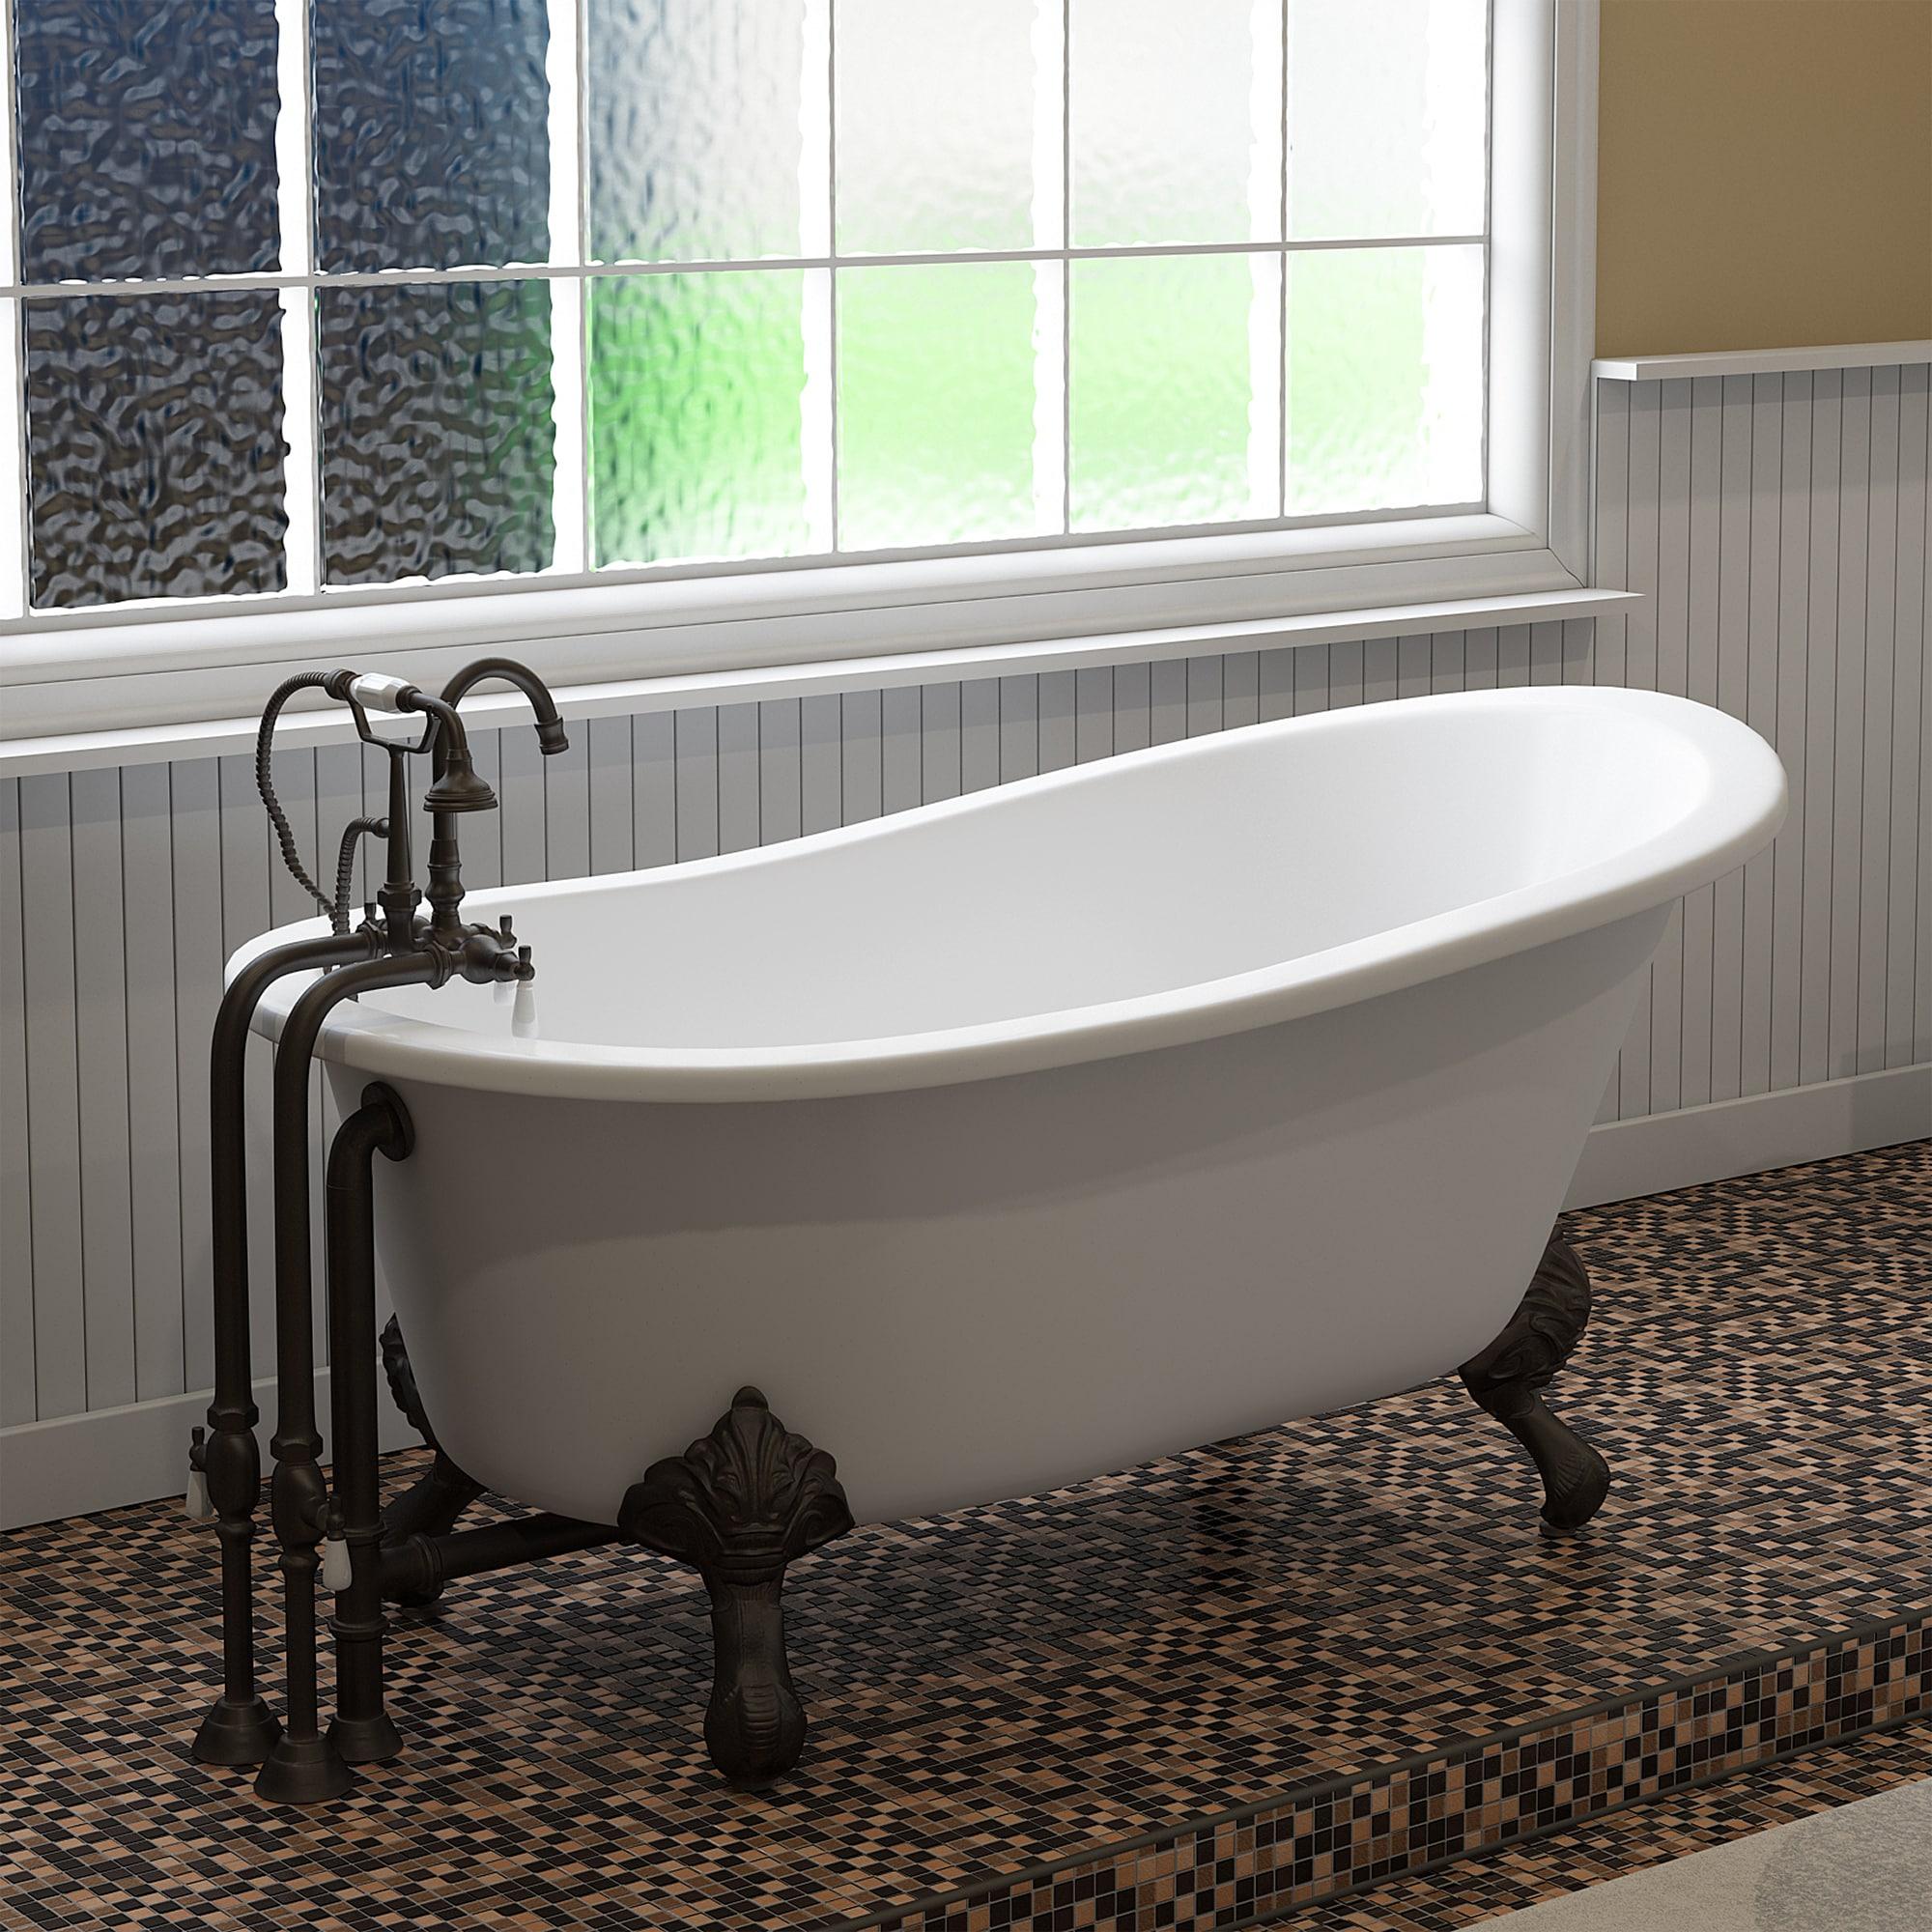 Ball And Claw Bath Tubs